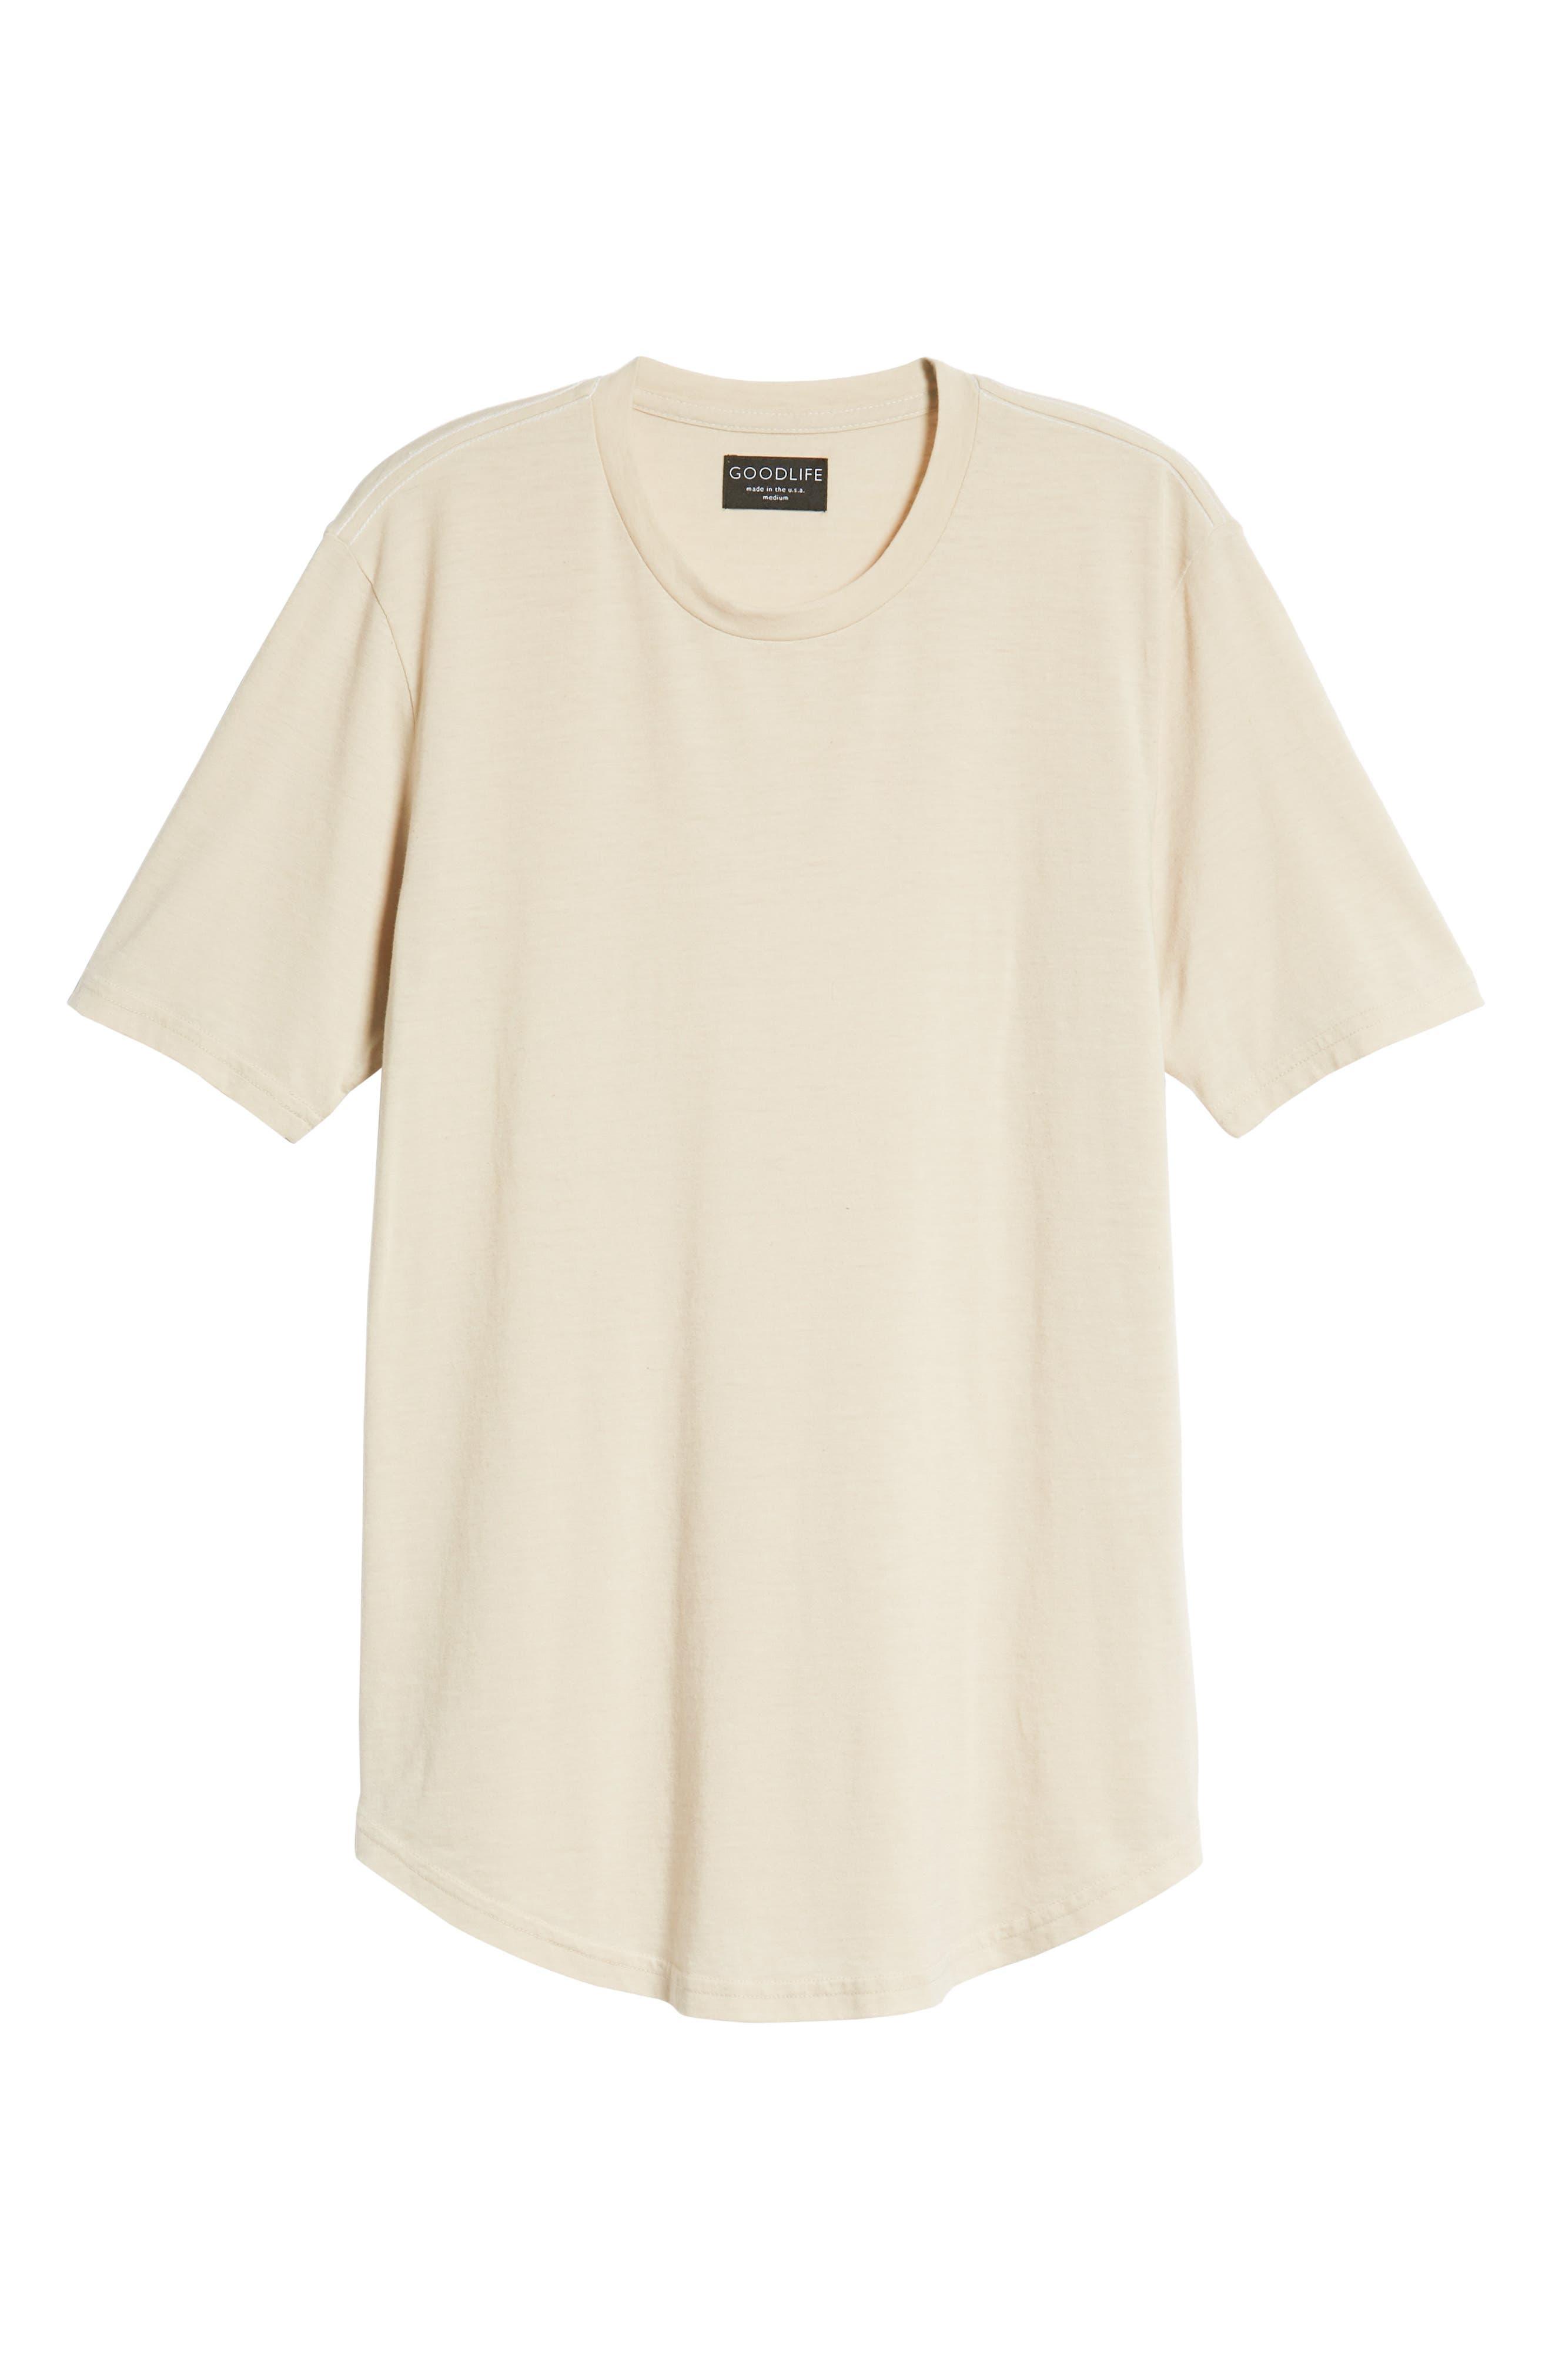 GOODLIFE, Scallop Triblend Crewneck T-Shirt, Alternate thumbnail 6, color, OYSTER